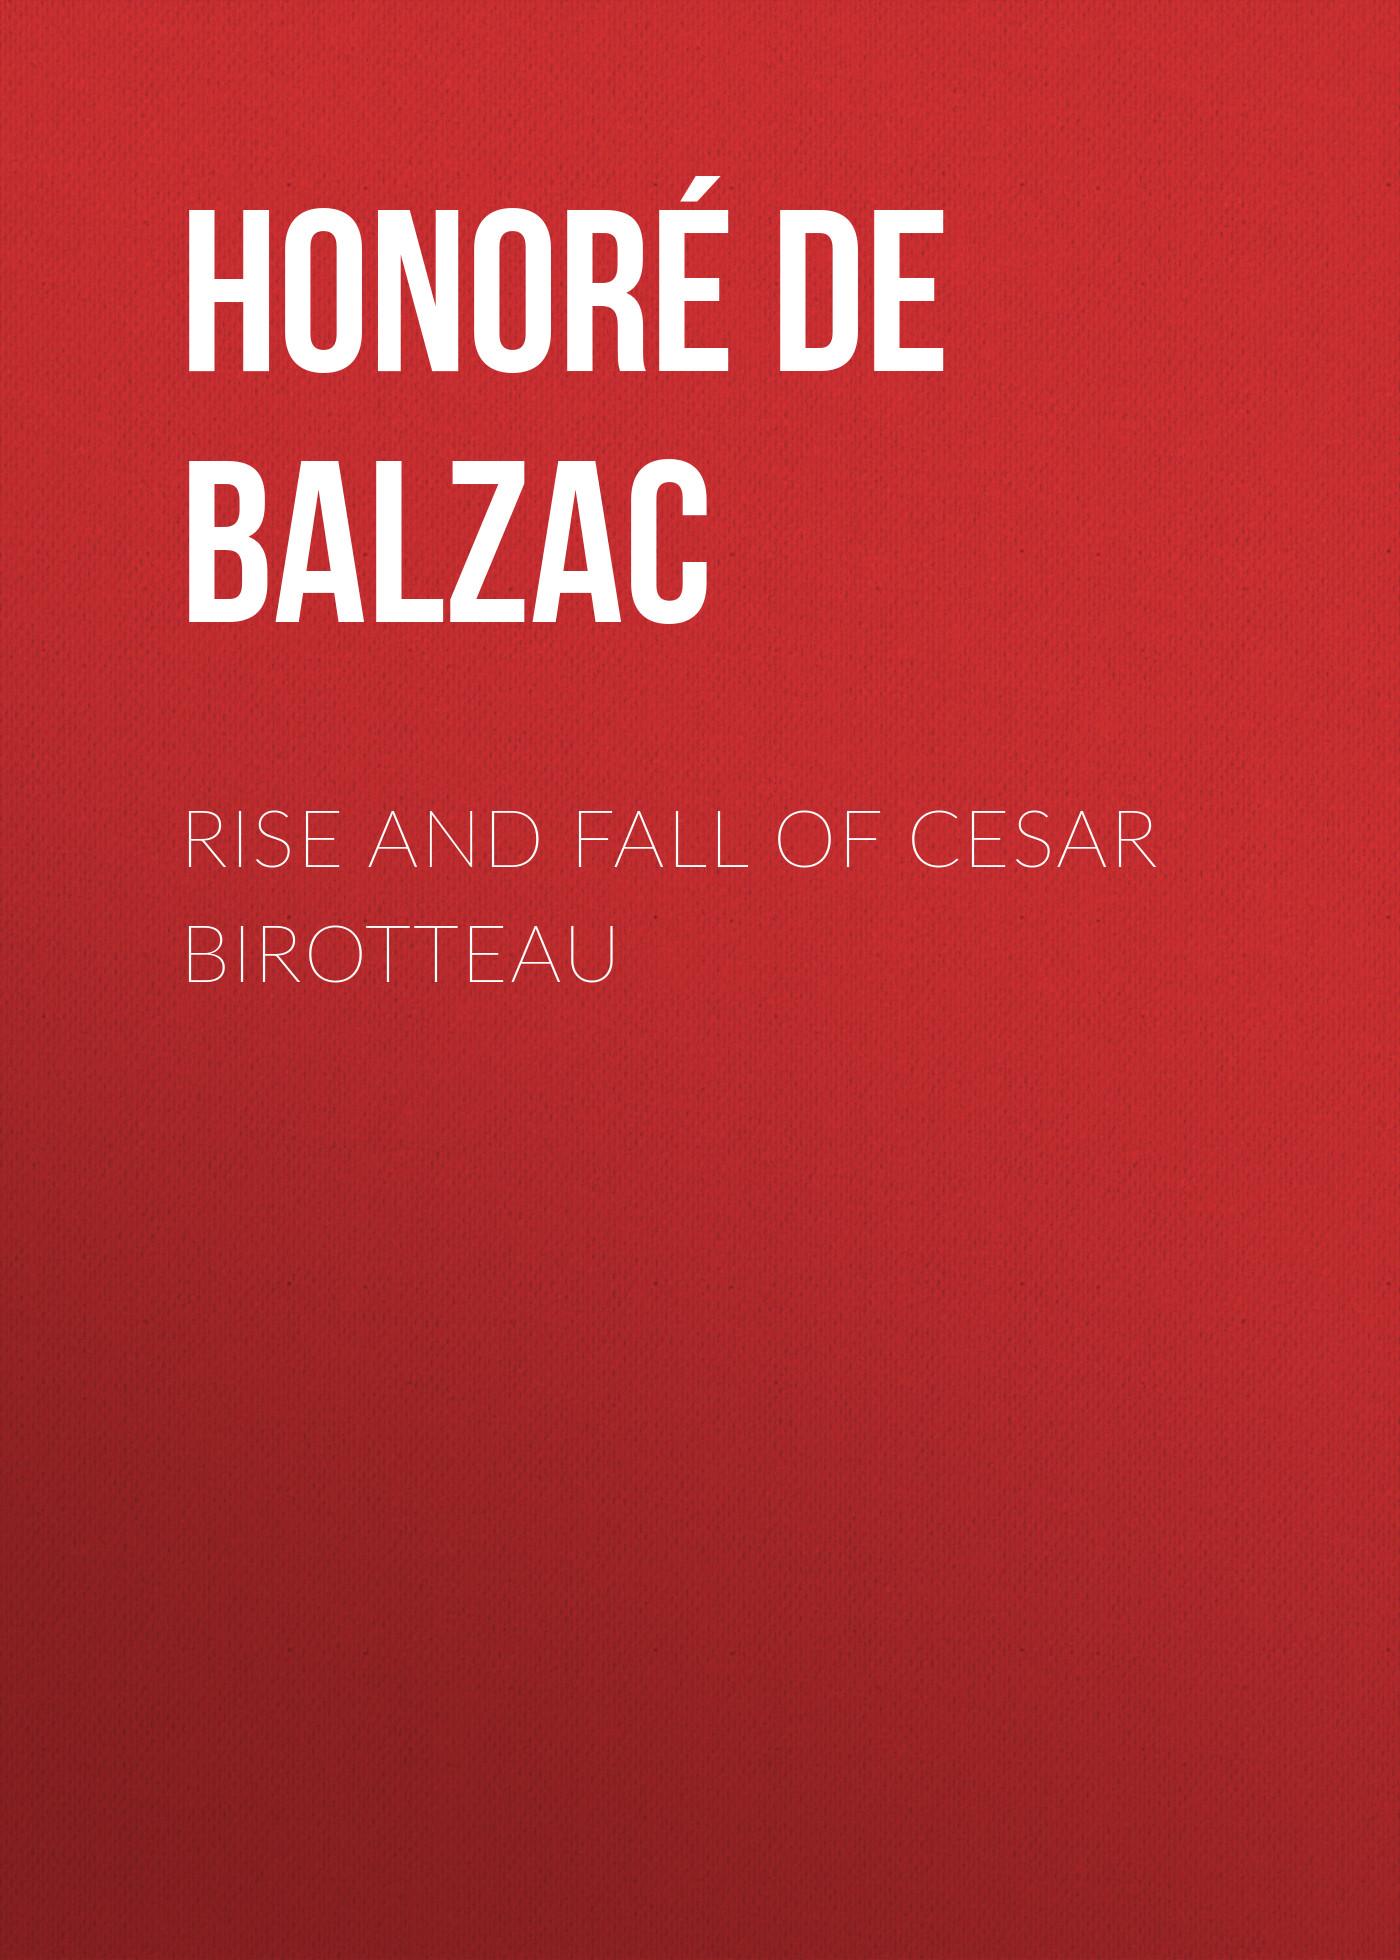 Оноре де Бальзак Rise and Fall of Cesar Birotteau